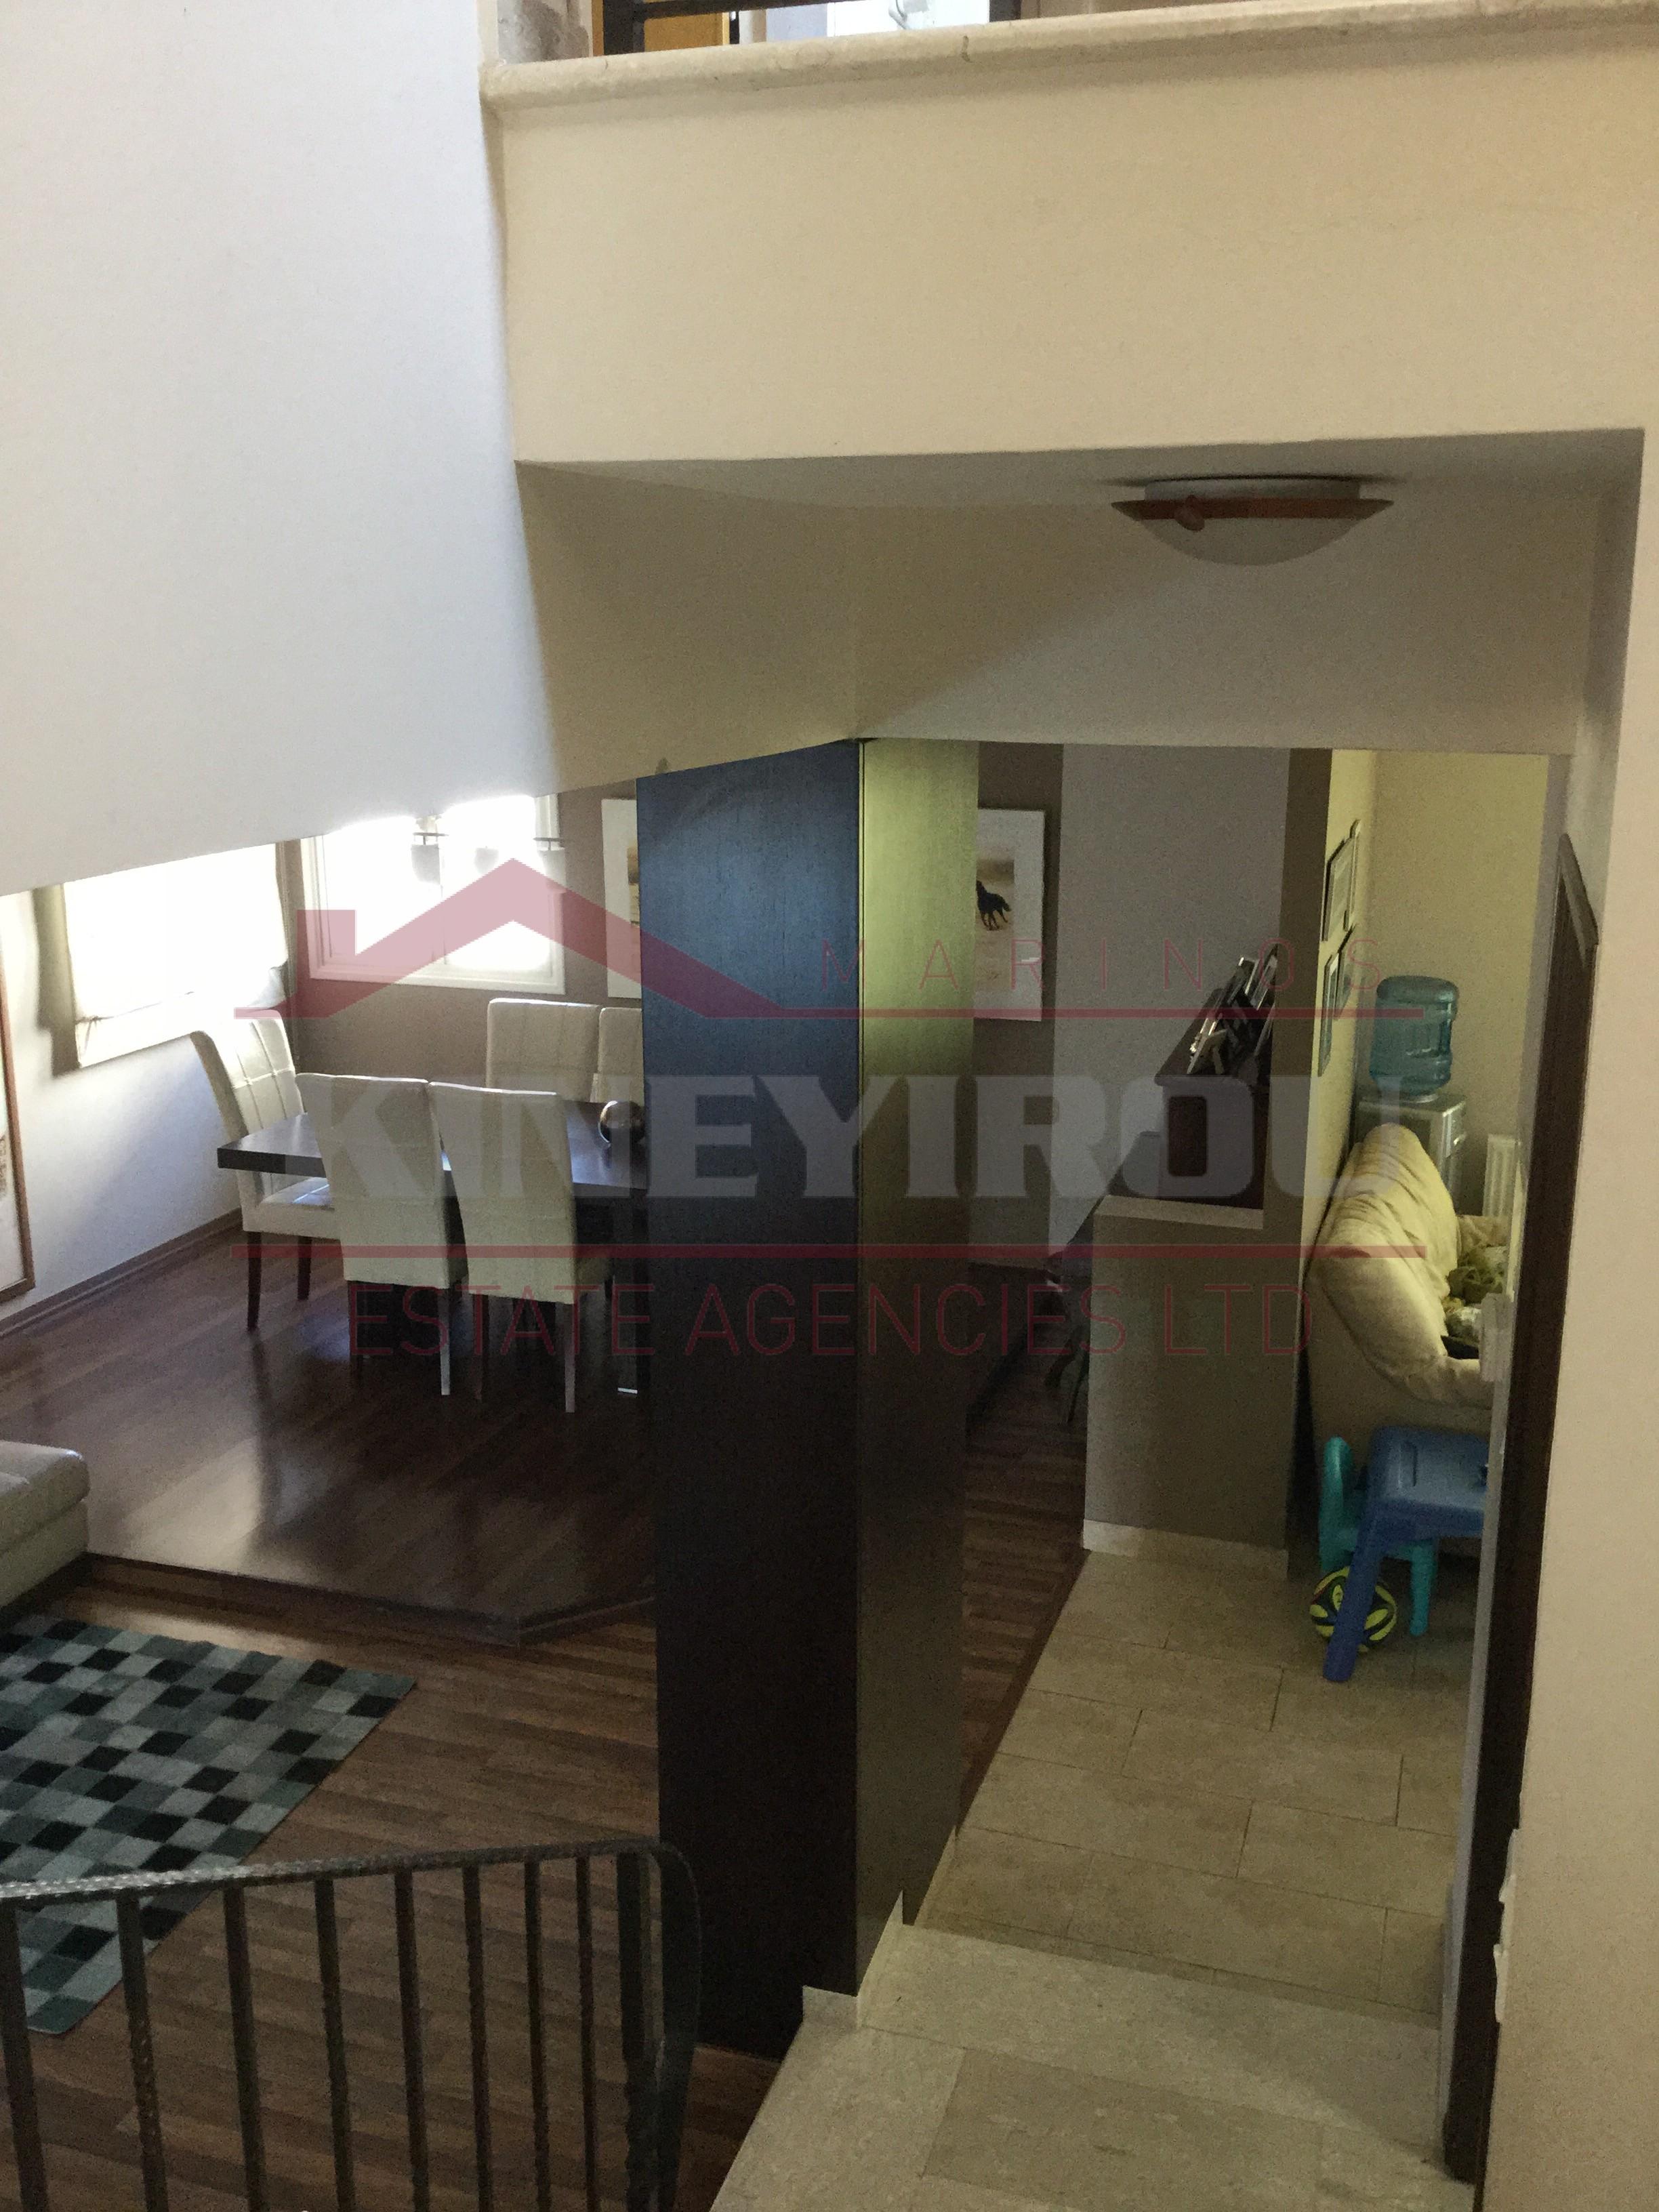 3 bedroom house  near G.C.Z – Stadium , Larnaca